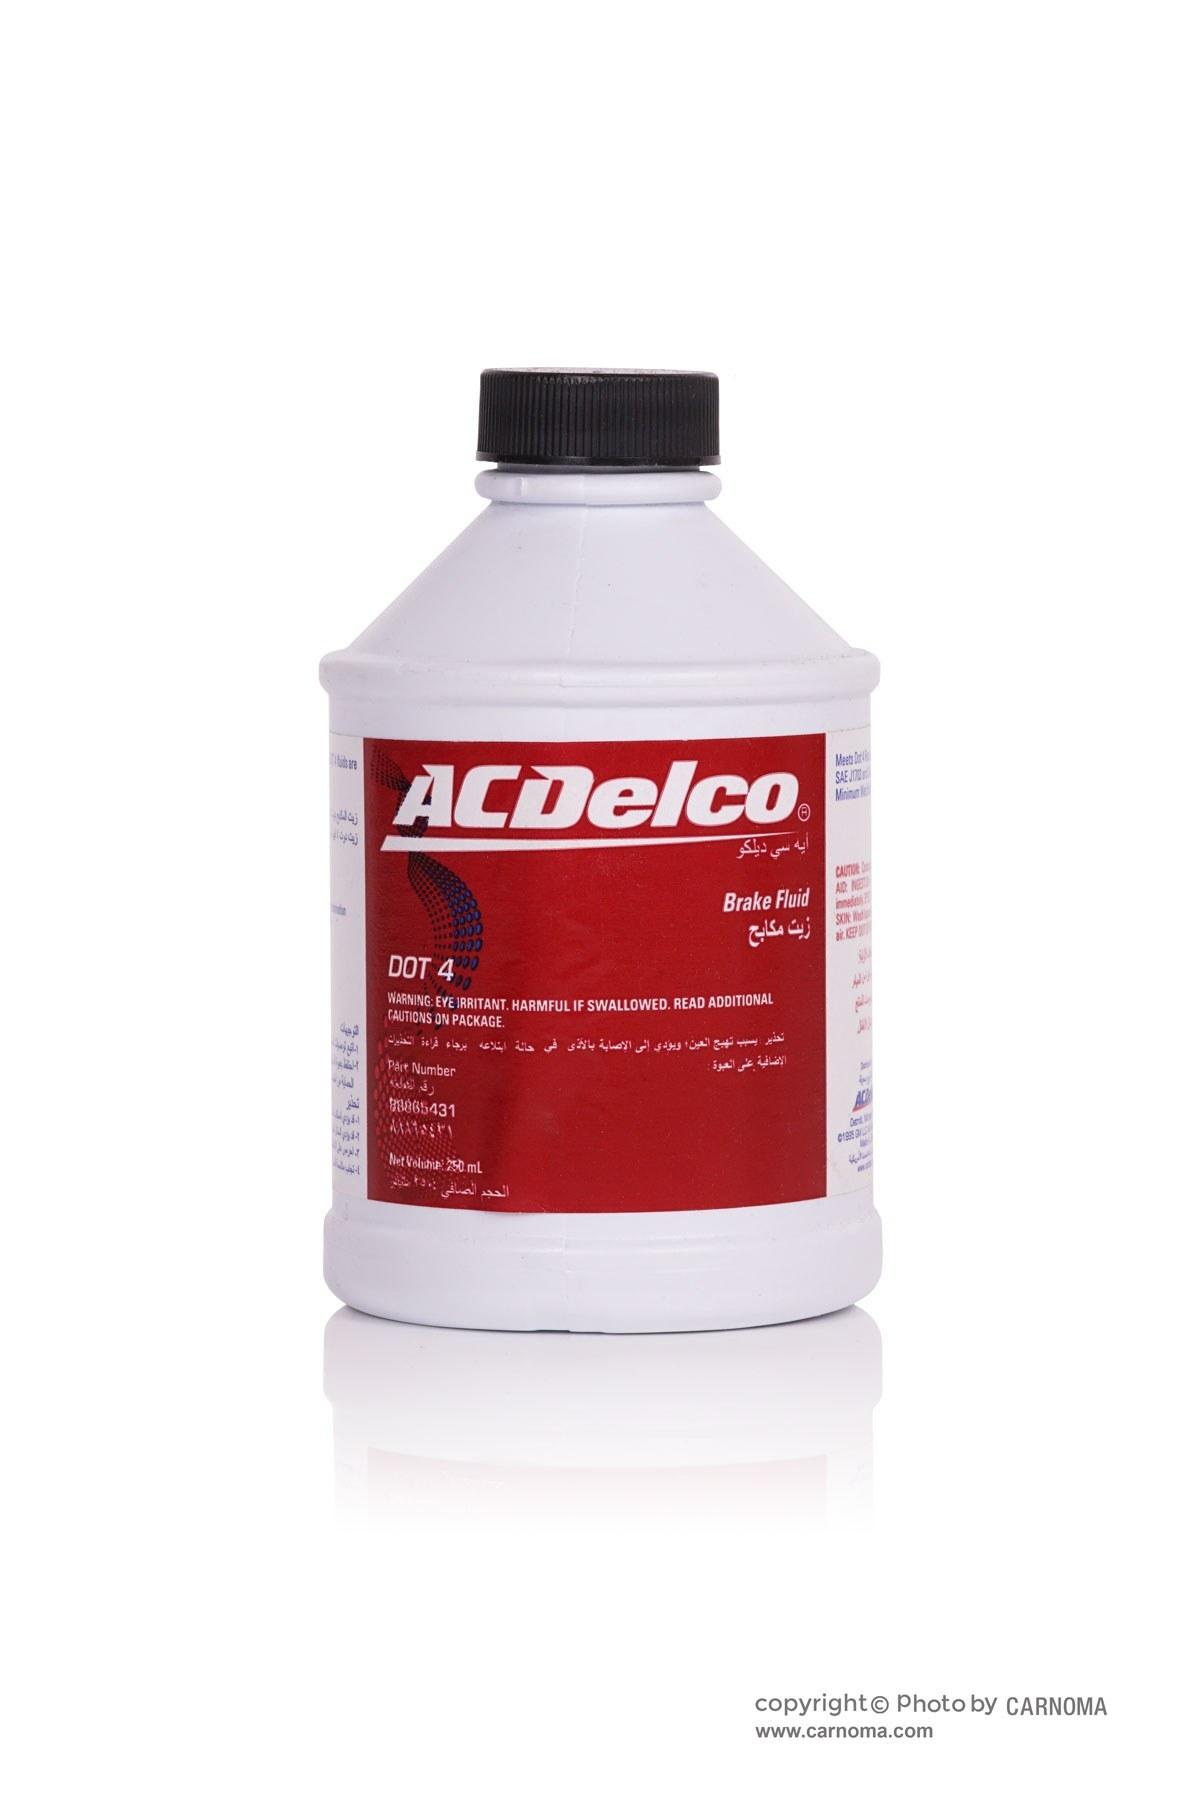 تصویر روغن ترمز ای سی دلکو DOT4 حجم 250 میلی لیتر Acdelco DOT4 Brake Fluid 250ml